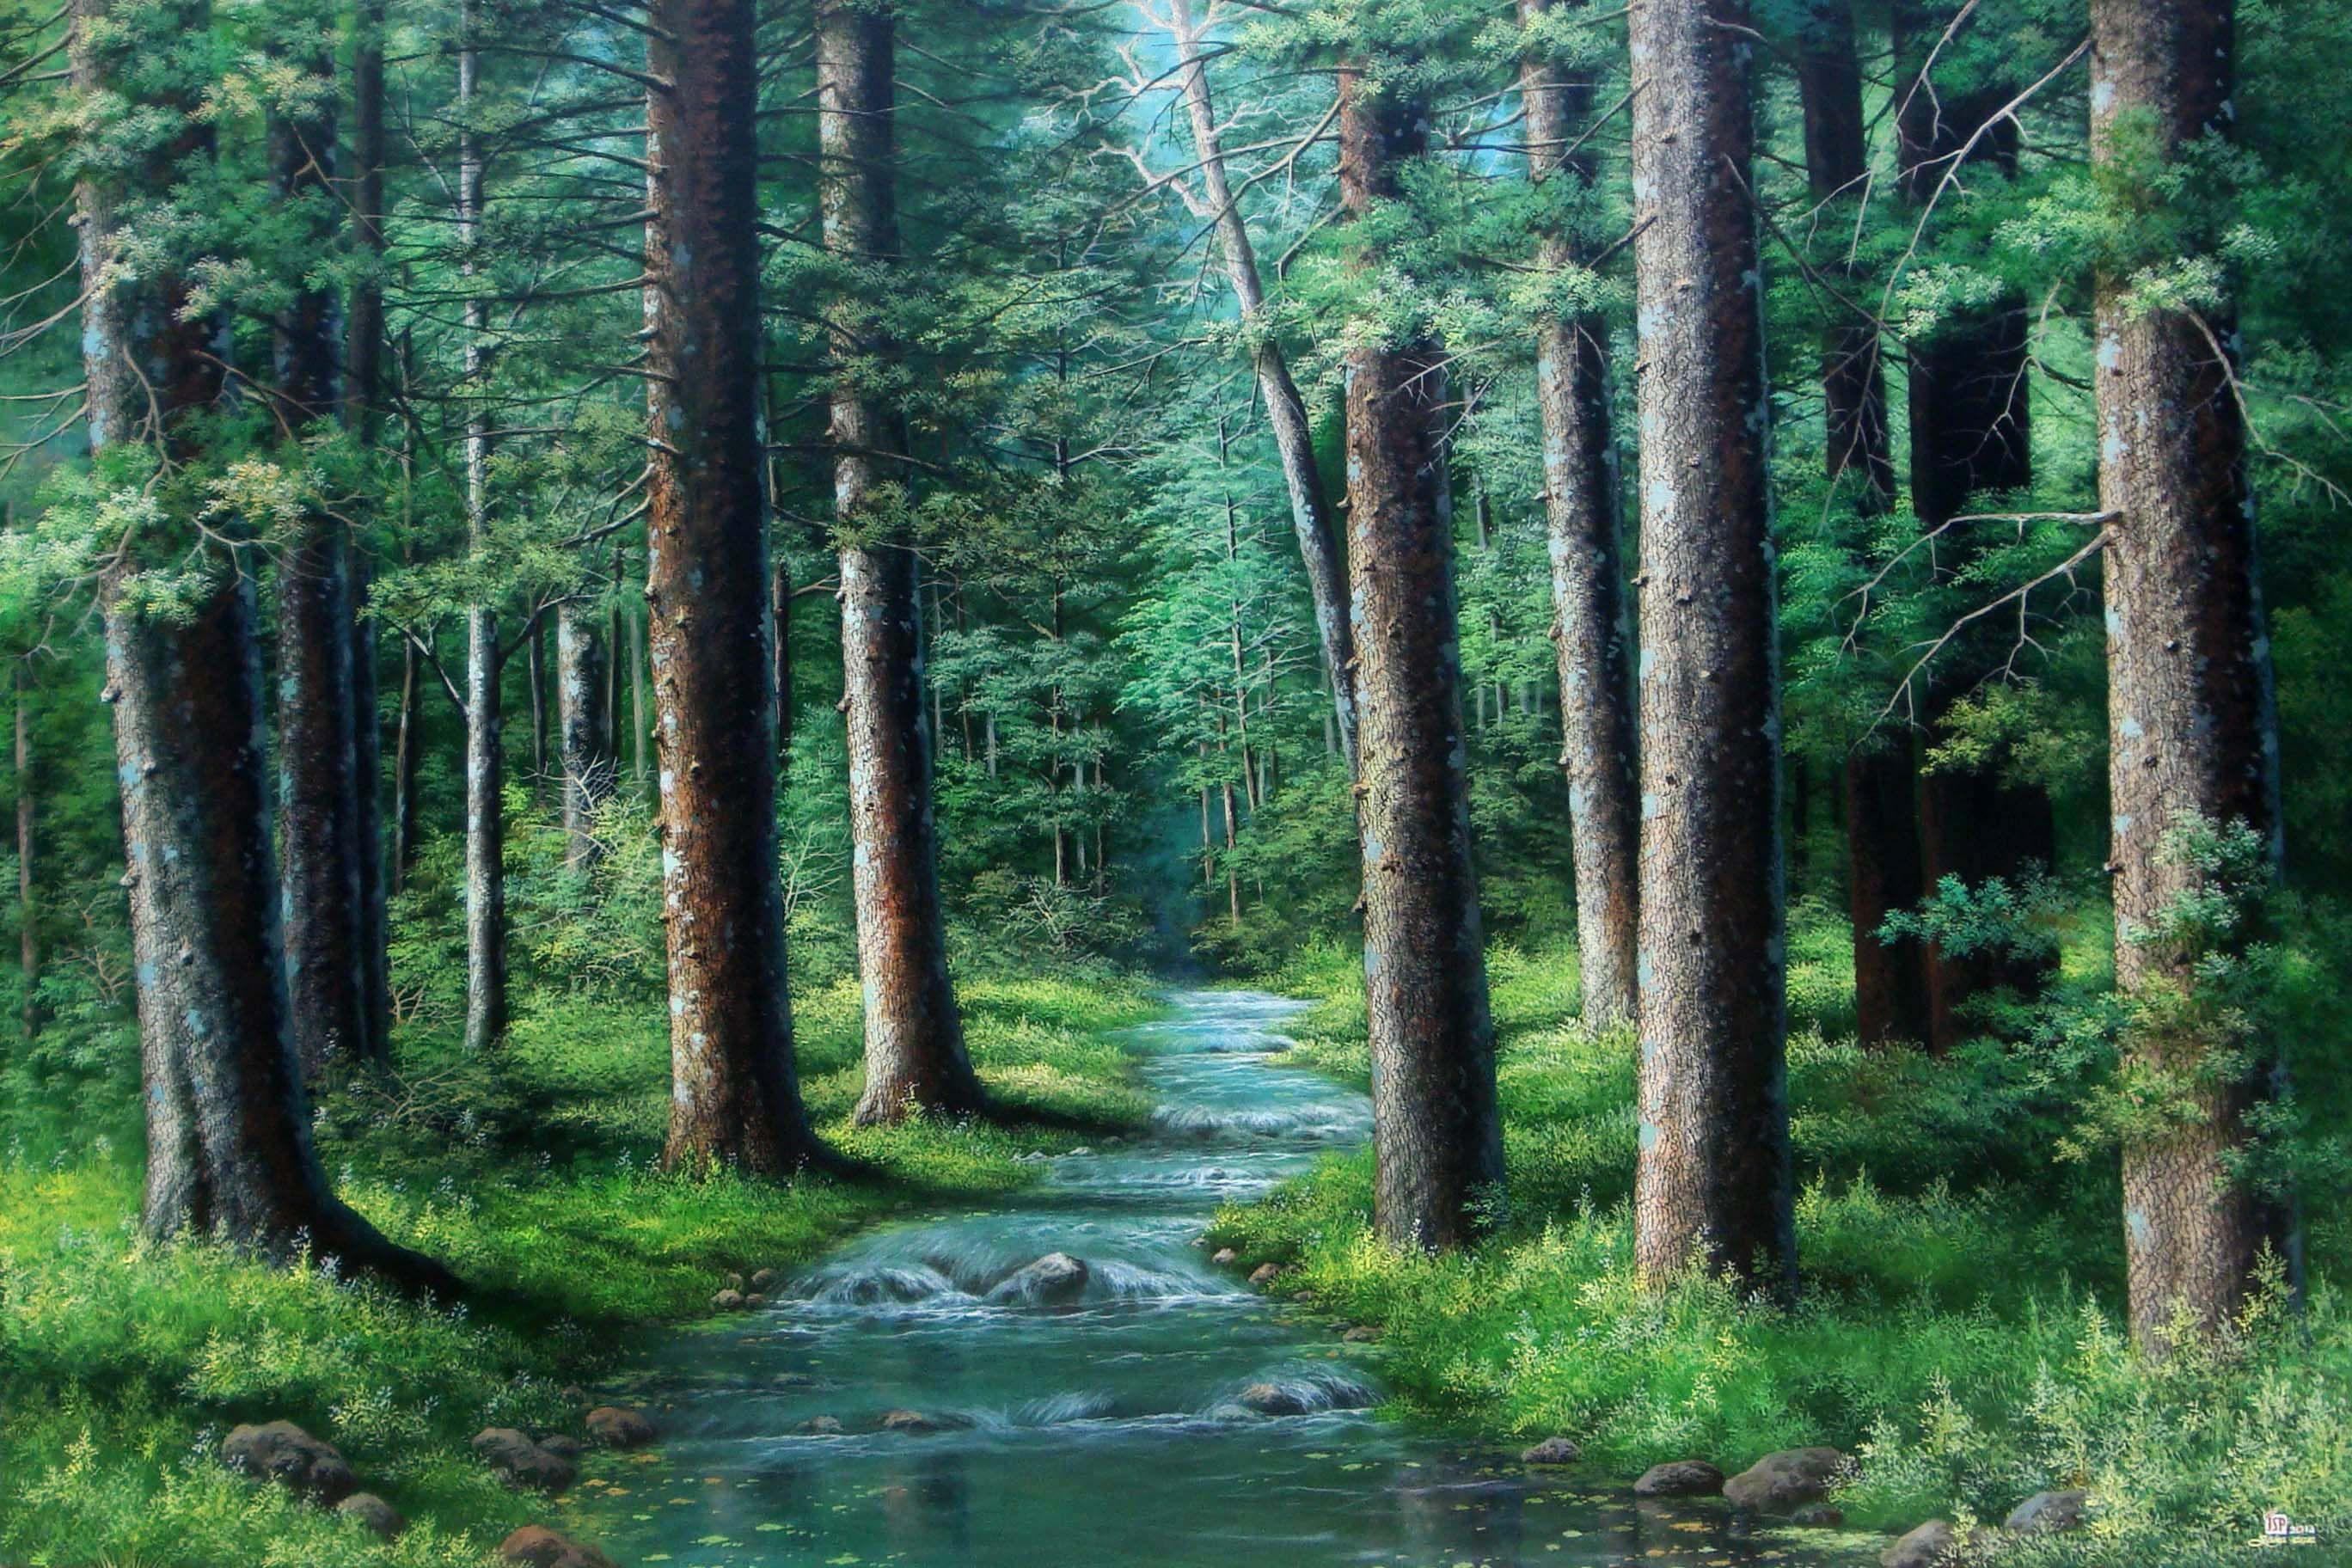 Hutan Pinus 2014 Acrylik On Canvas 100 150 Cm By Jaka Espe